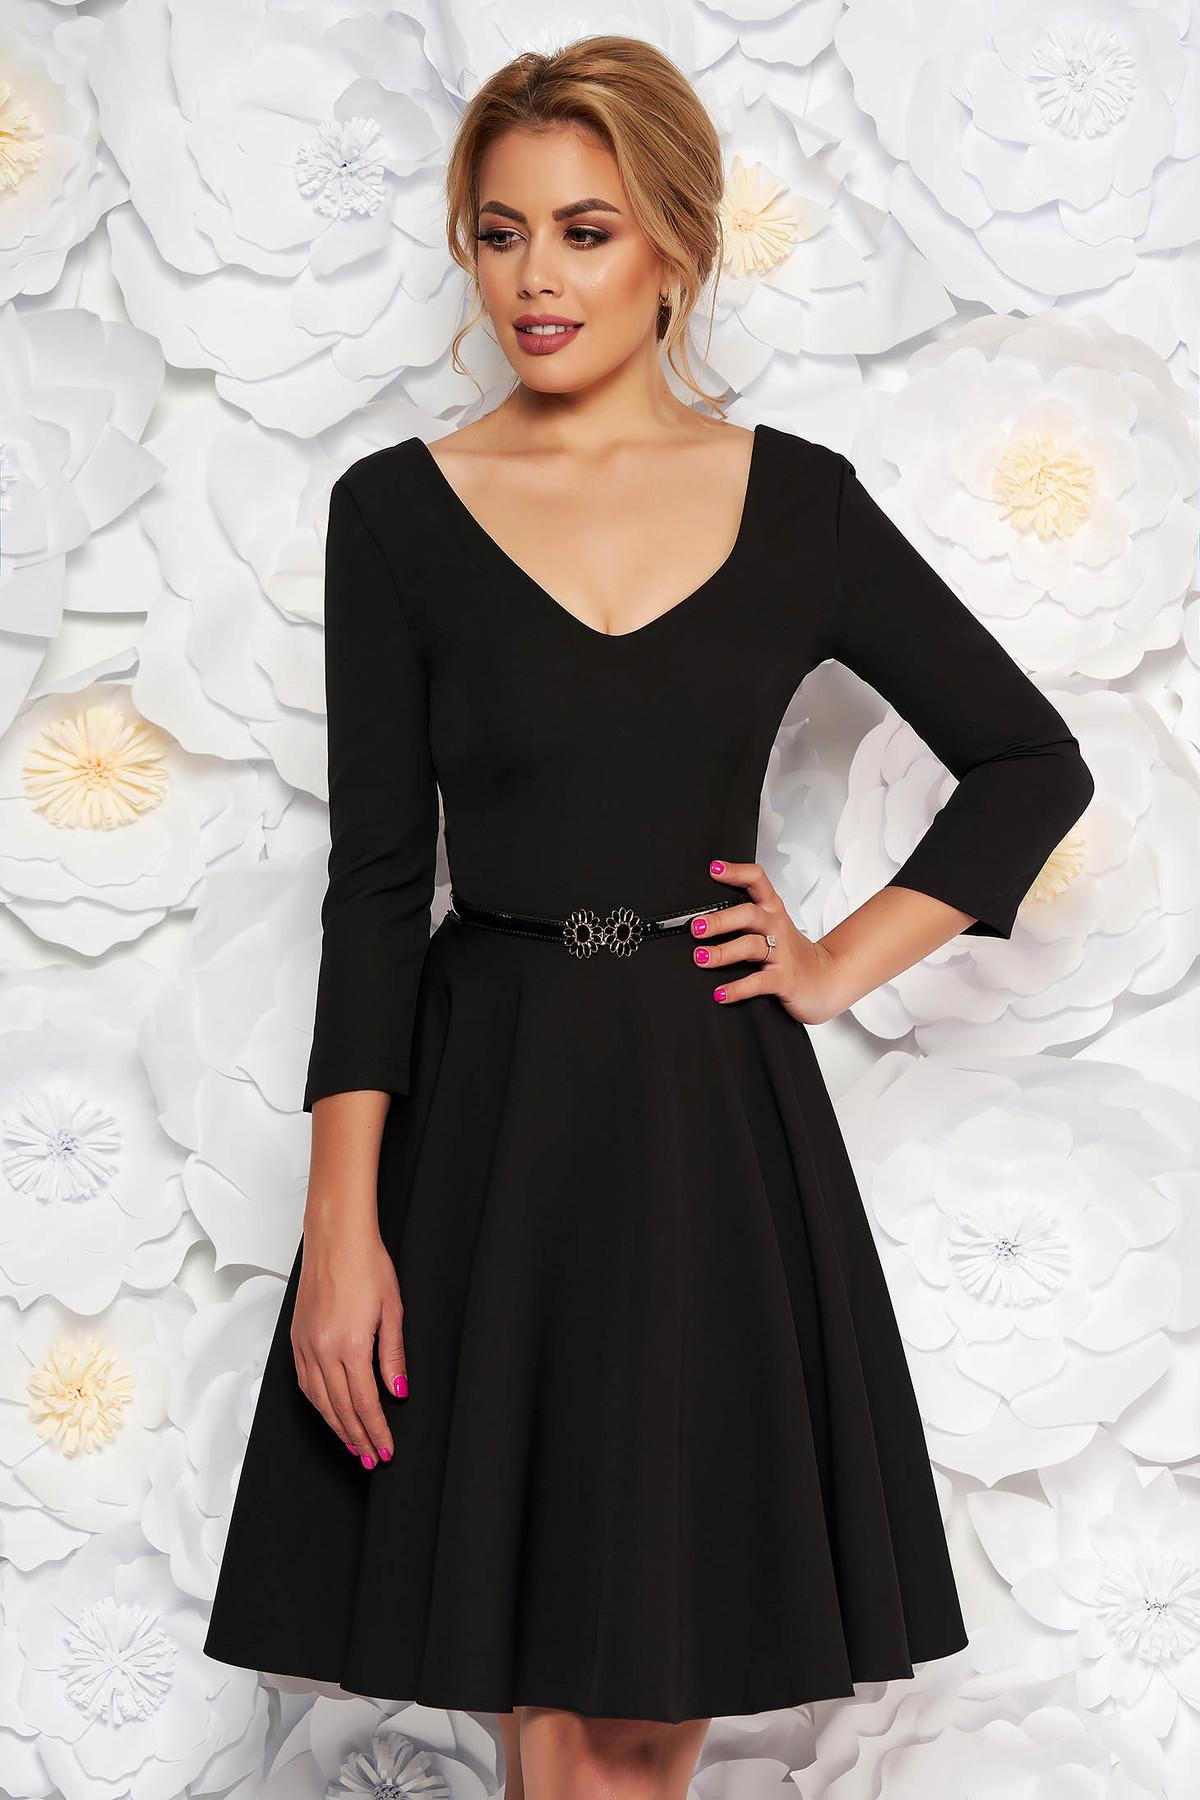 Rochie StarShinerS neagra eleganta in clos din stofa subtire usor elastica cu accesoriu tip curea